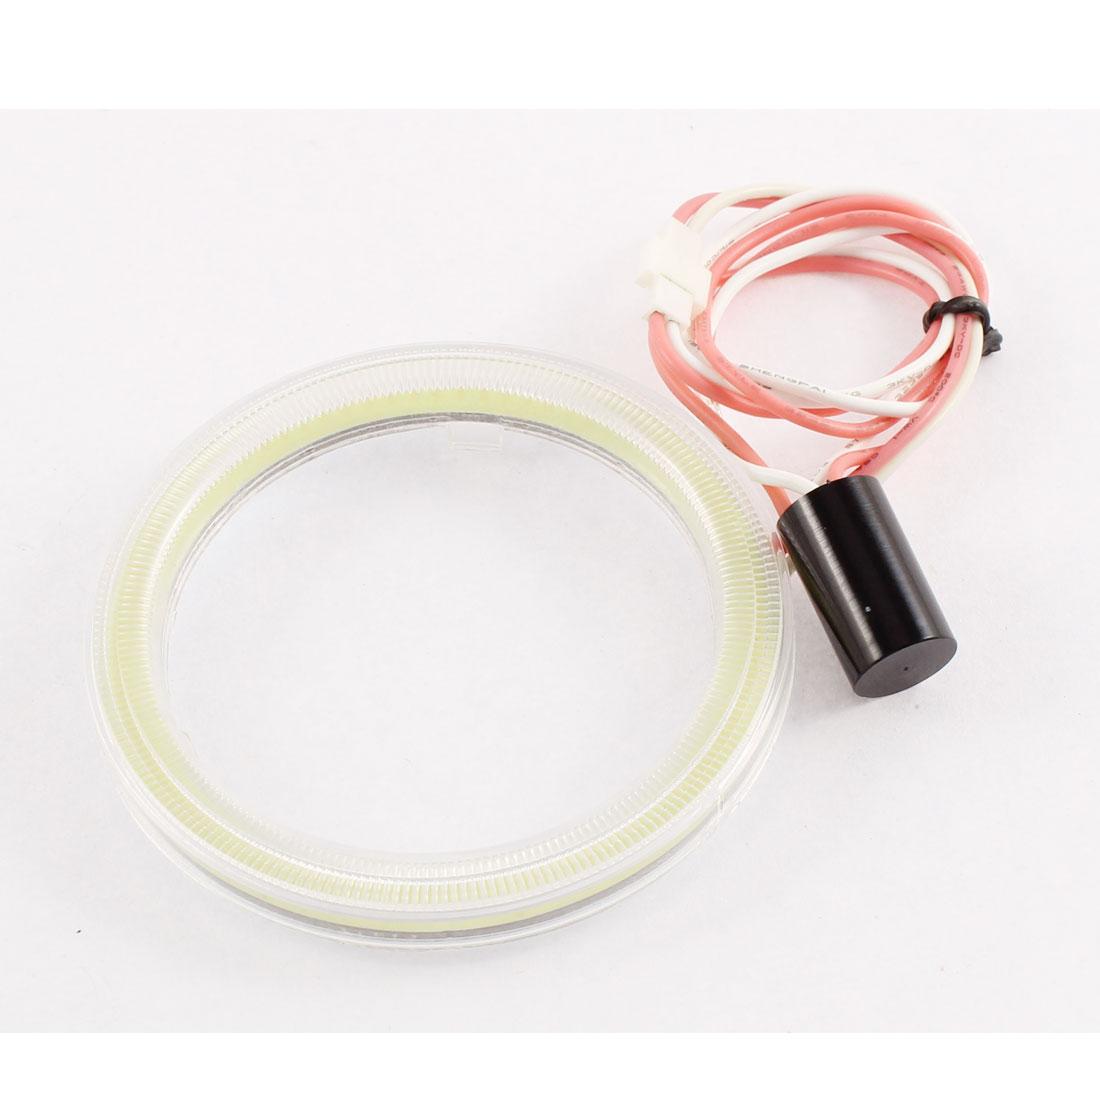 White Angel Eye Ring Headlight COB Lamp Spare Blub 70mm Dia for Auto Car